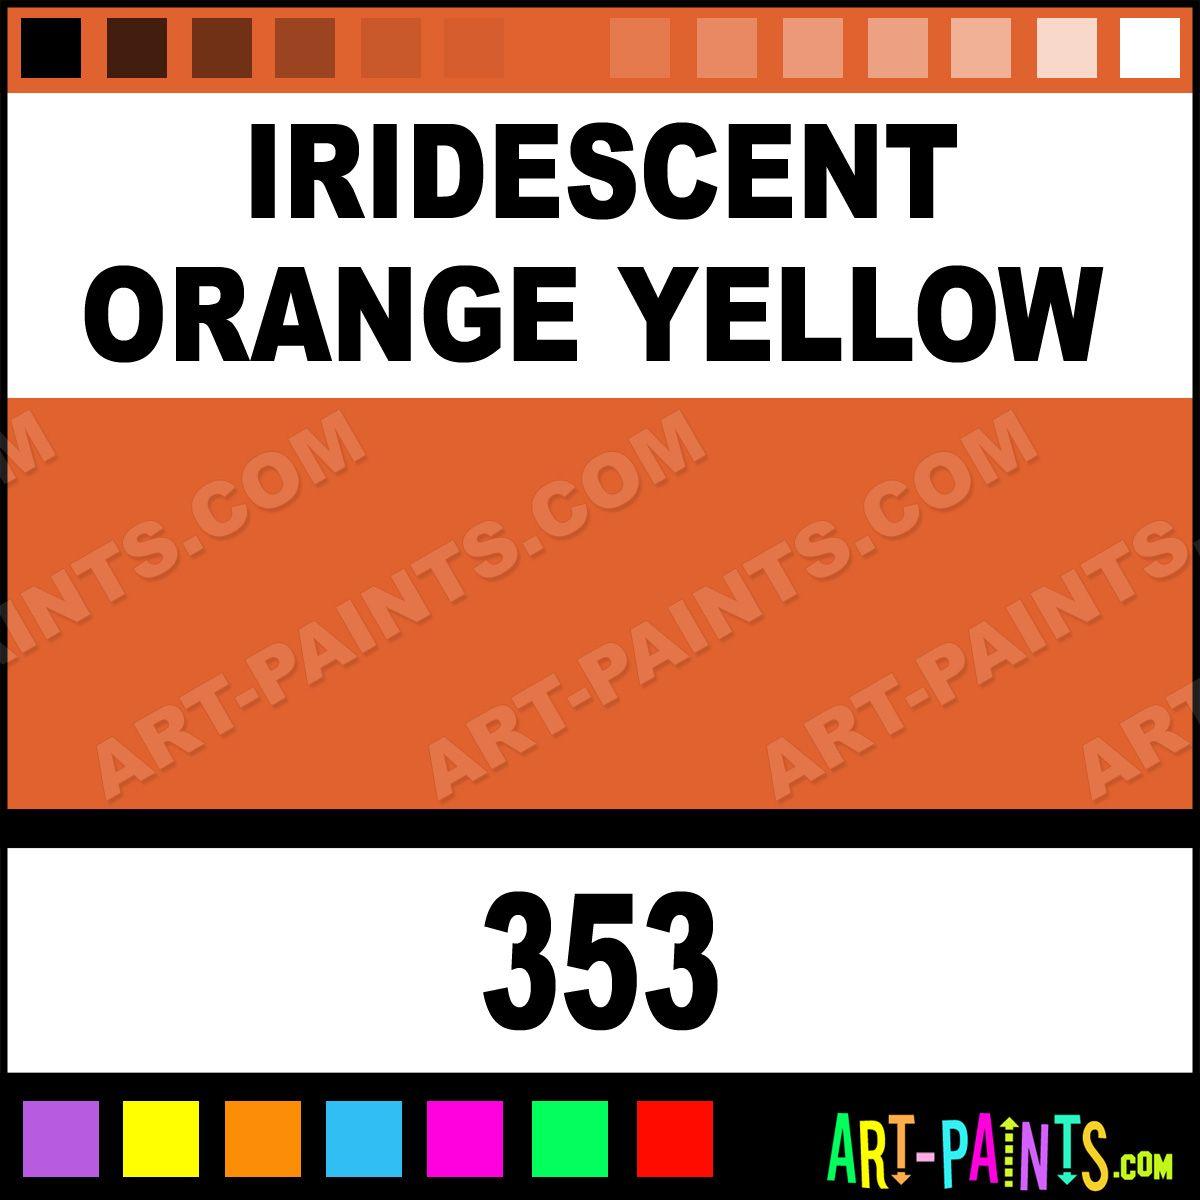 Iridescent Orange Yellow Studio Acrylic Paints 353 Iridescent Orange Yellow Paint Iridescent Orange Yellow Yellow Painting Orange Paint Colors Yellow Art